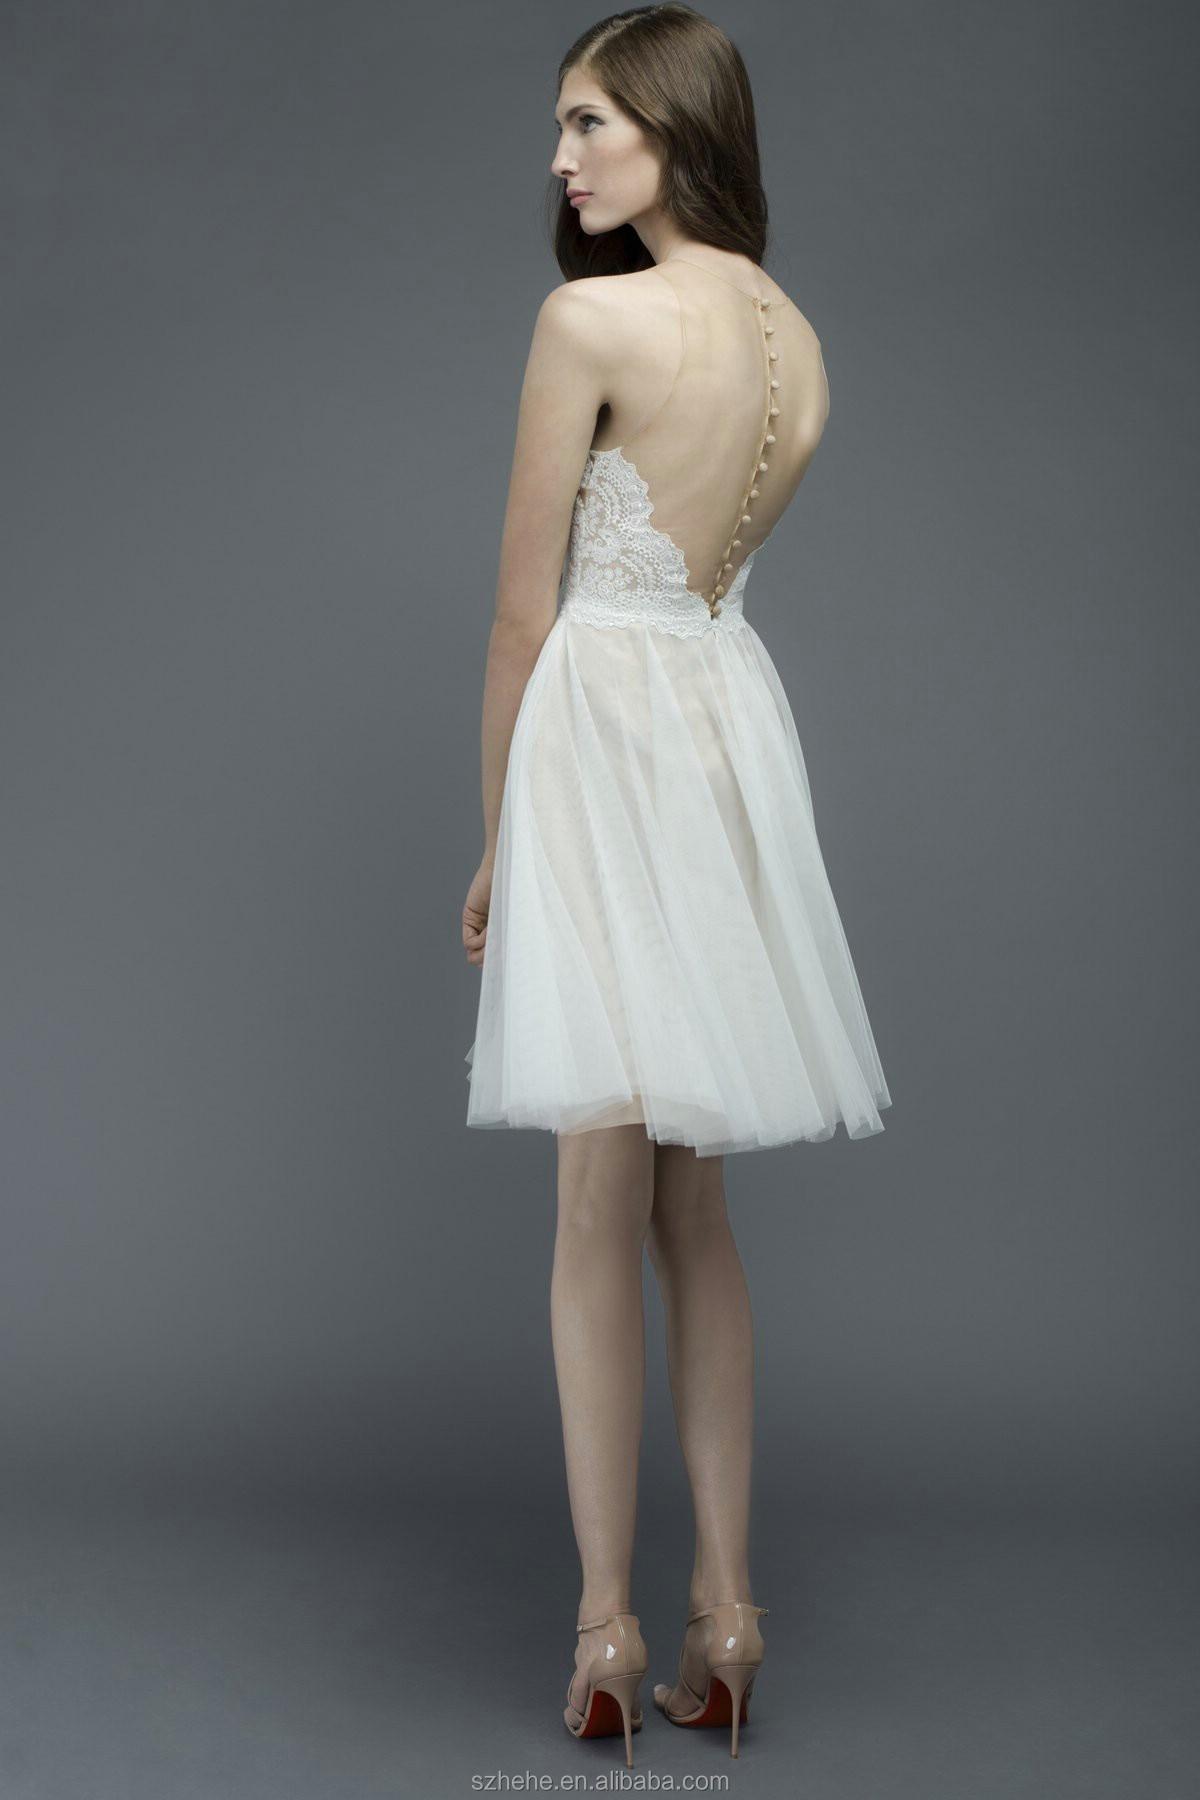 sexy short wedding dress designs sexy short wedding dresses Sexy Short Wedding Dress Designs Picture